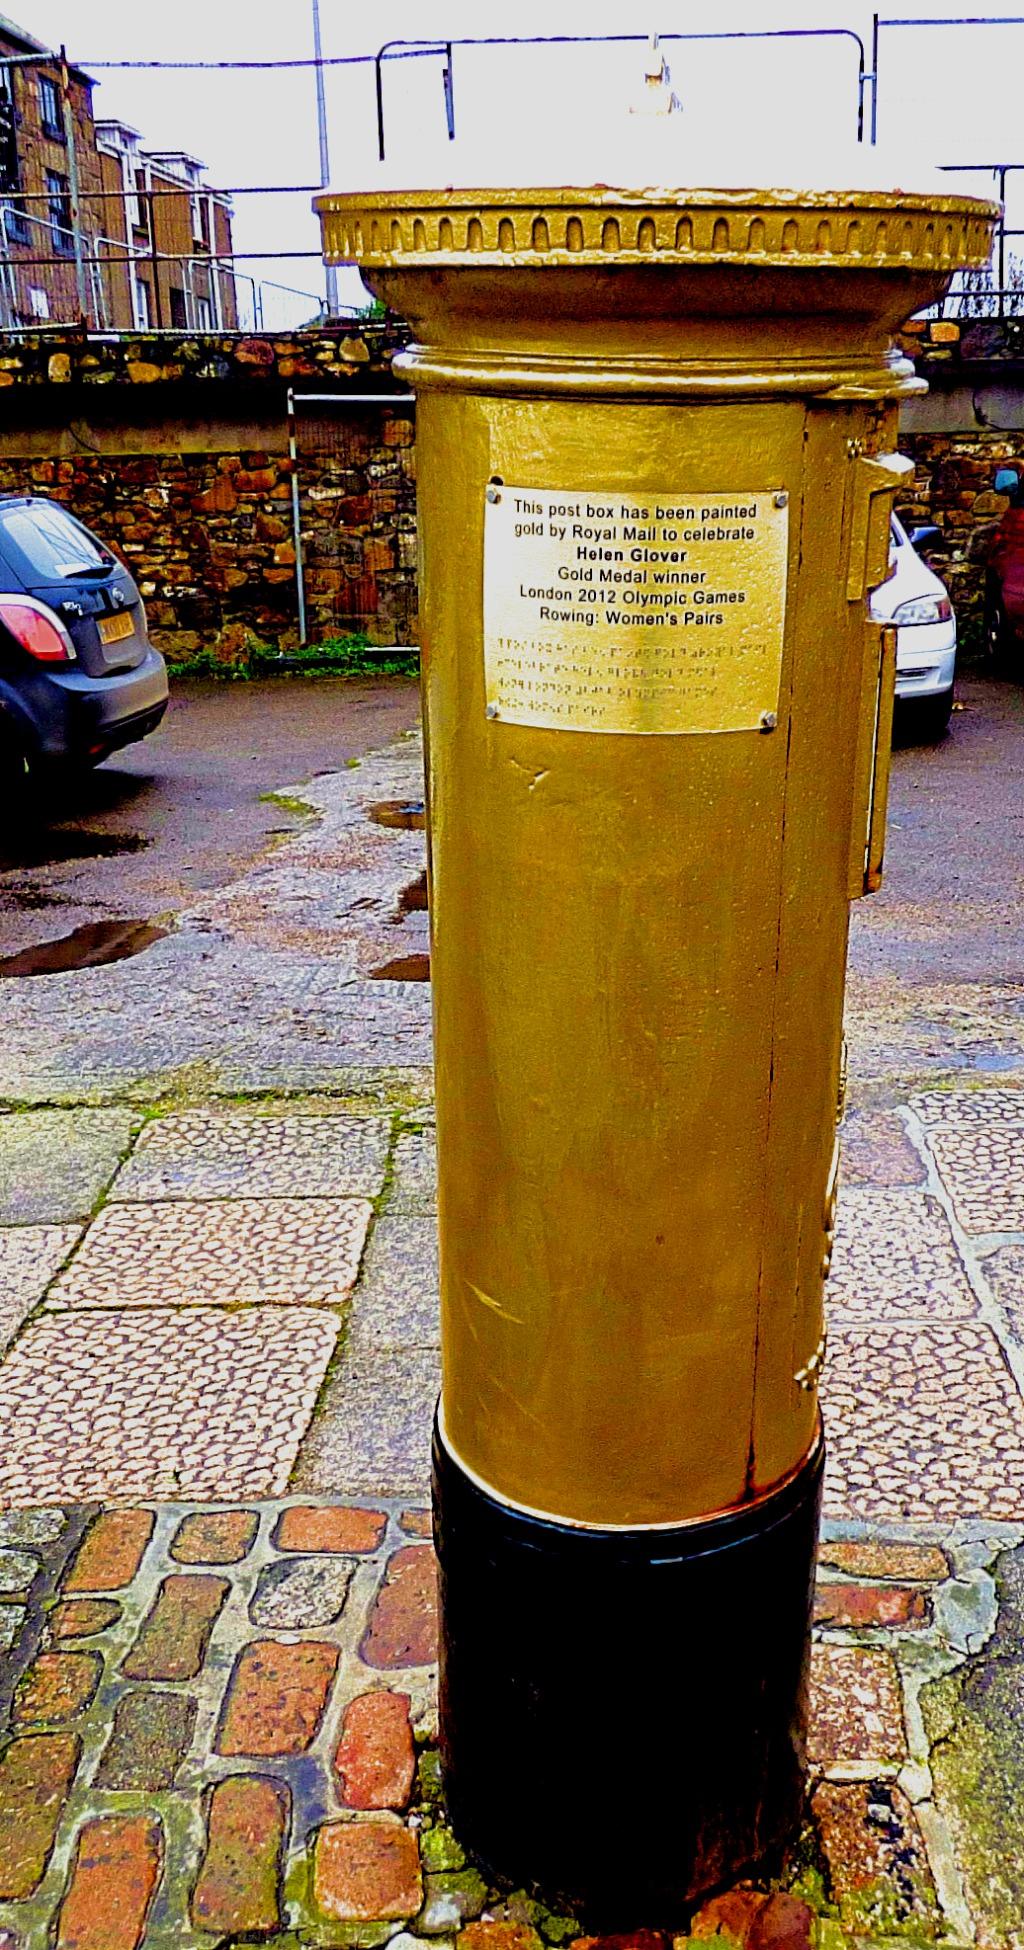 Helen Glover post box